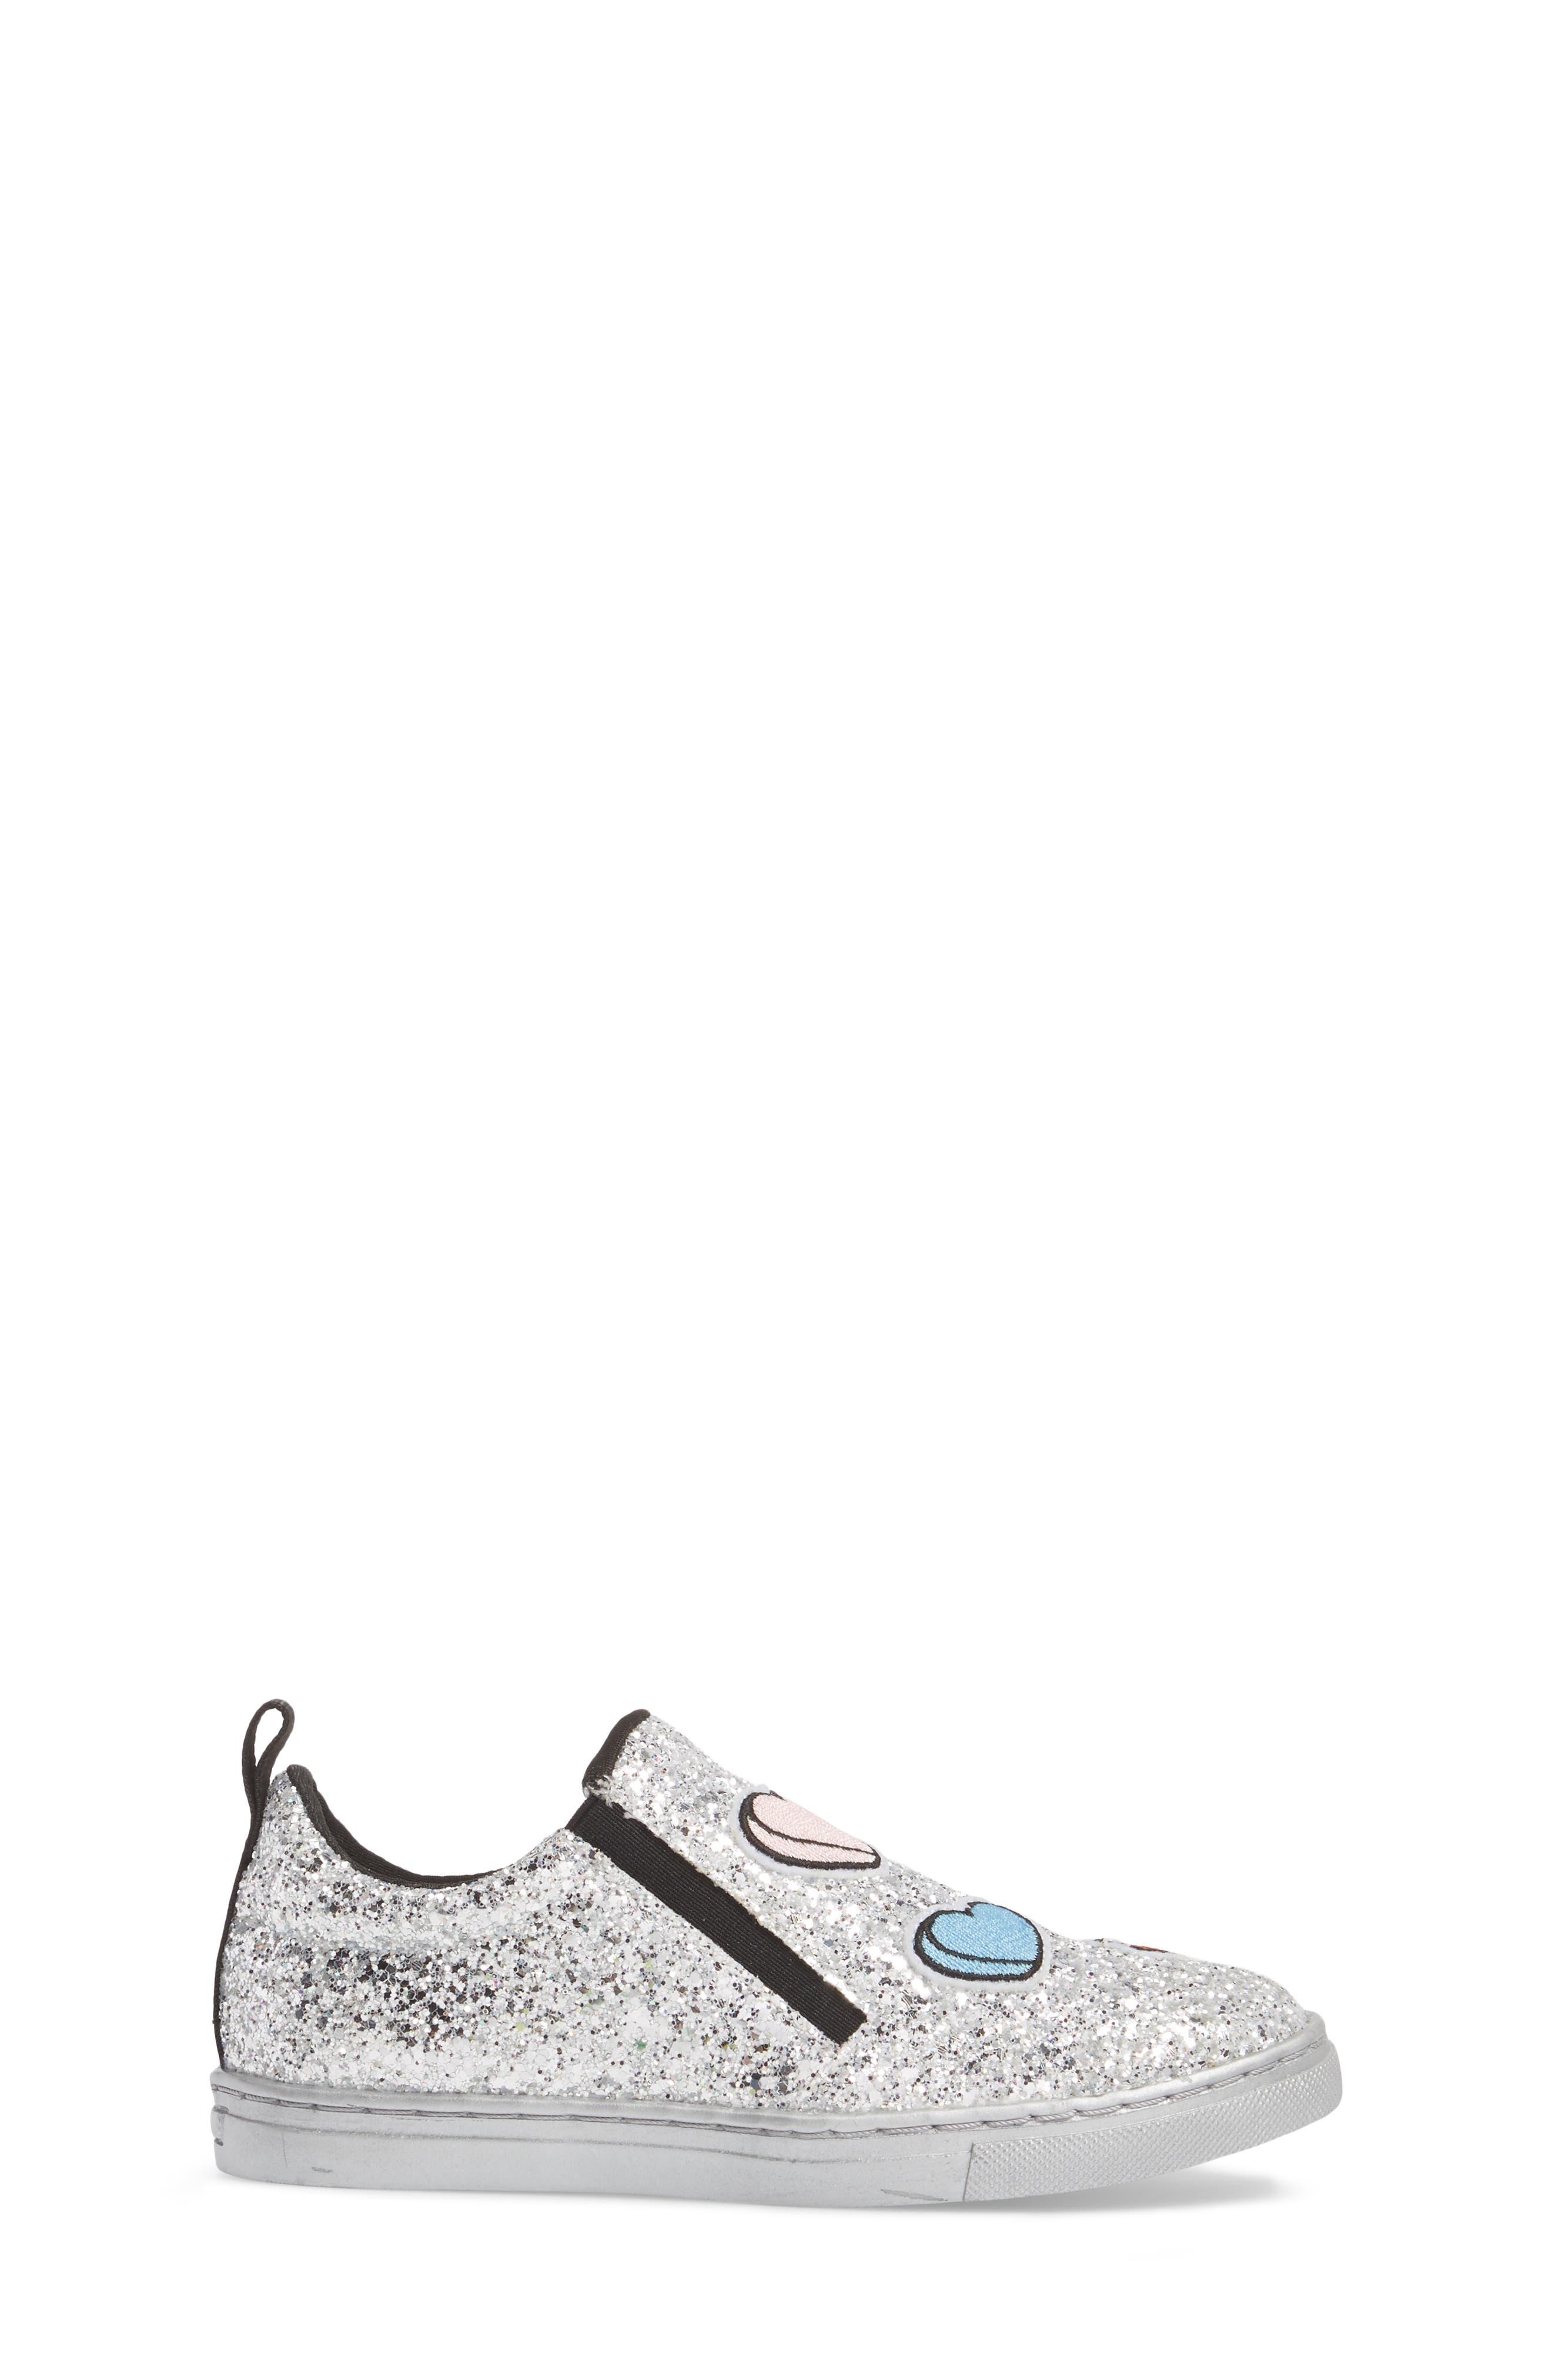 Zach Sneaker,                             Alternate thumbnail 3, color,                             040